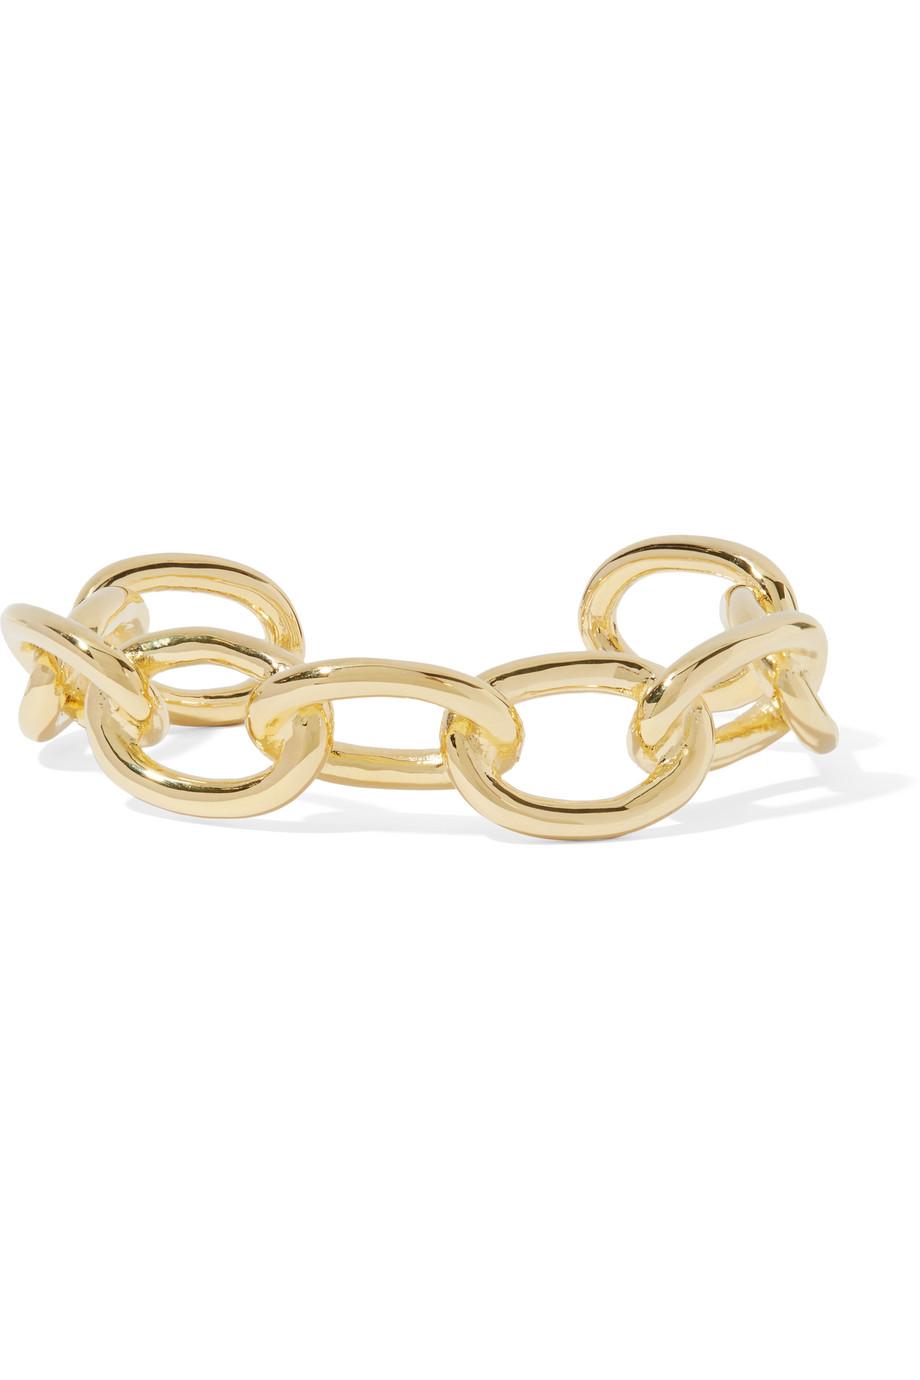 Jennifer Fisher Small Chain Link Gold-Plated Cuff, Women's